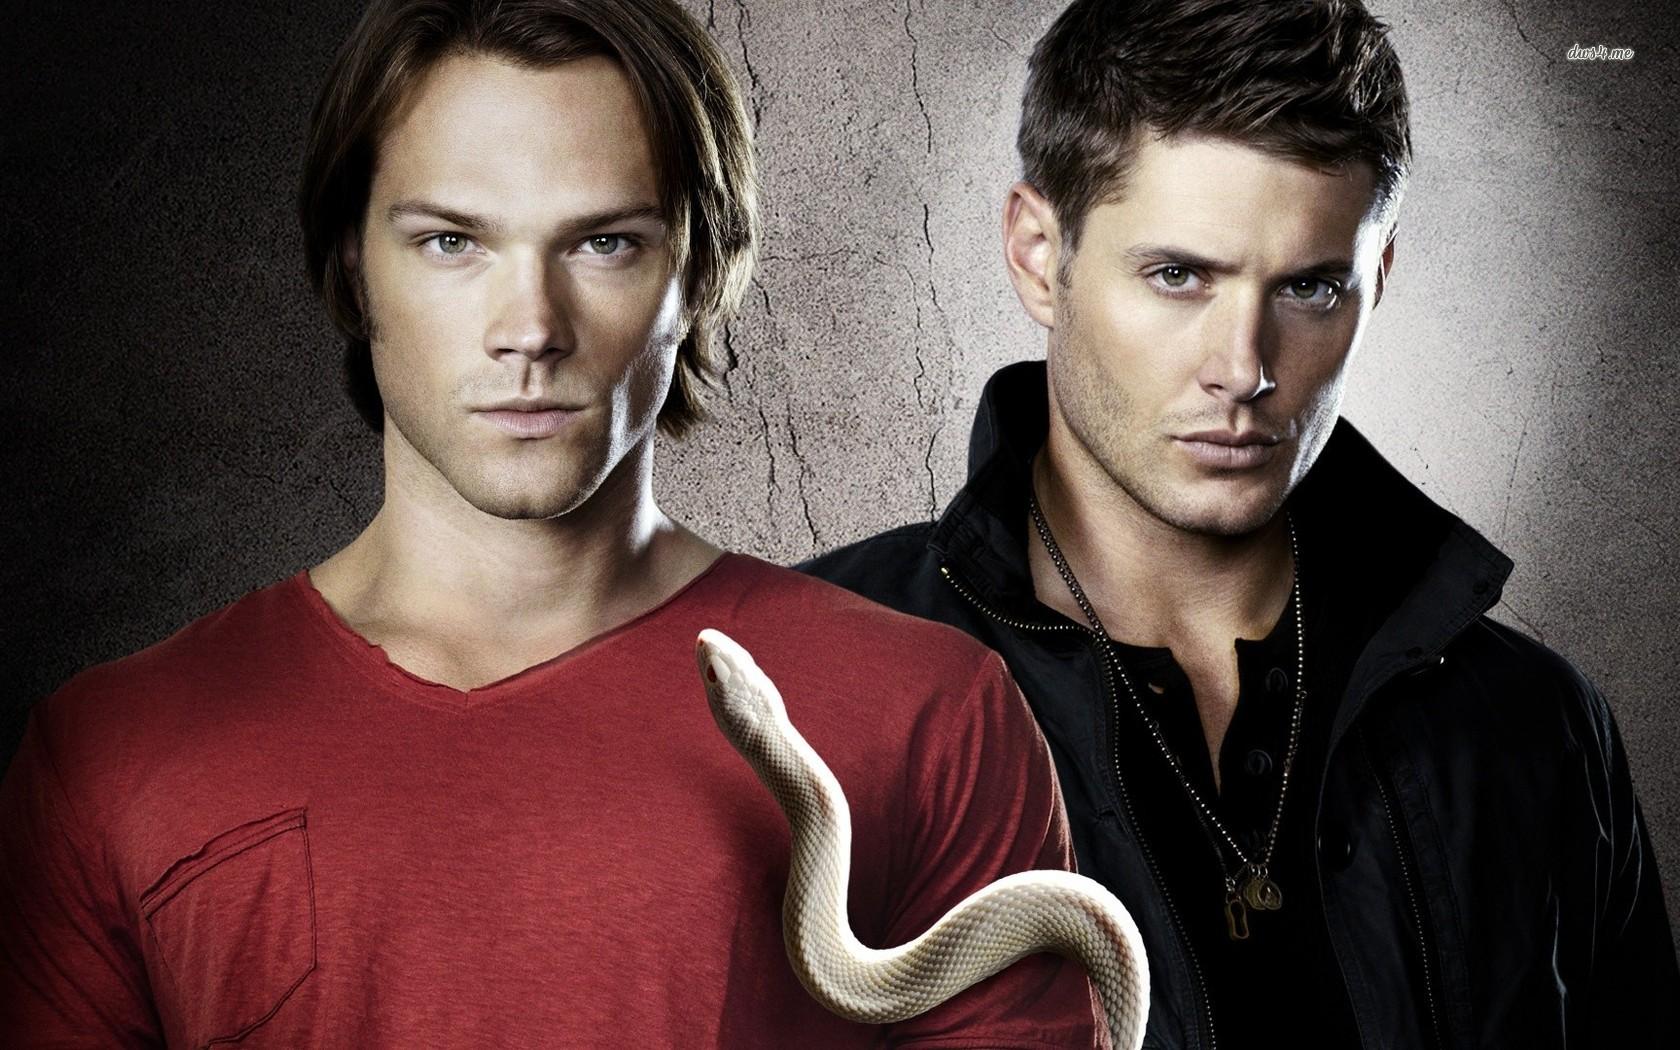 Sam and Dean Winchester Wallpaper - WallpaperSafari